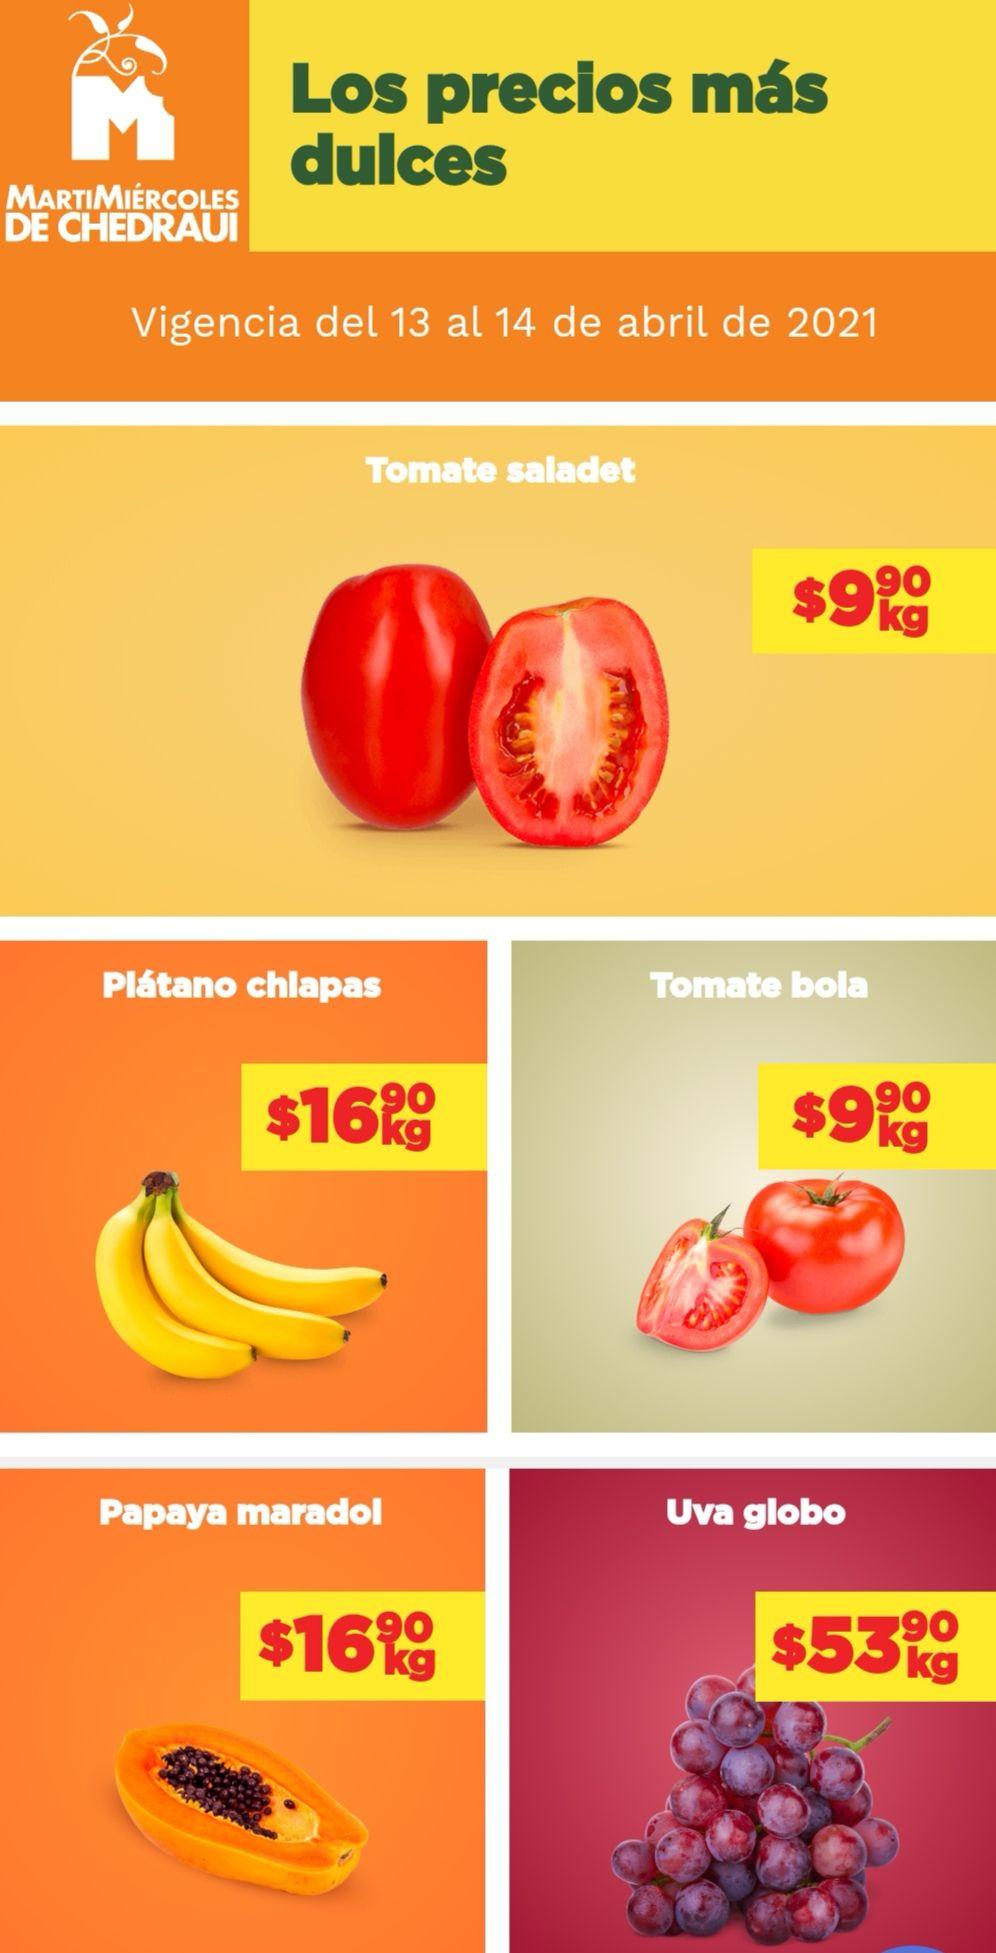 Chedraui: MartiMiércoles de Chedraui 13 y 14 Abril: Jitomate Saladet ó Bola $9.90 kg... Plátano ó Papaya $16.90 kg.